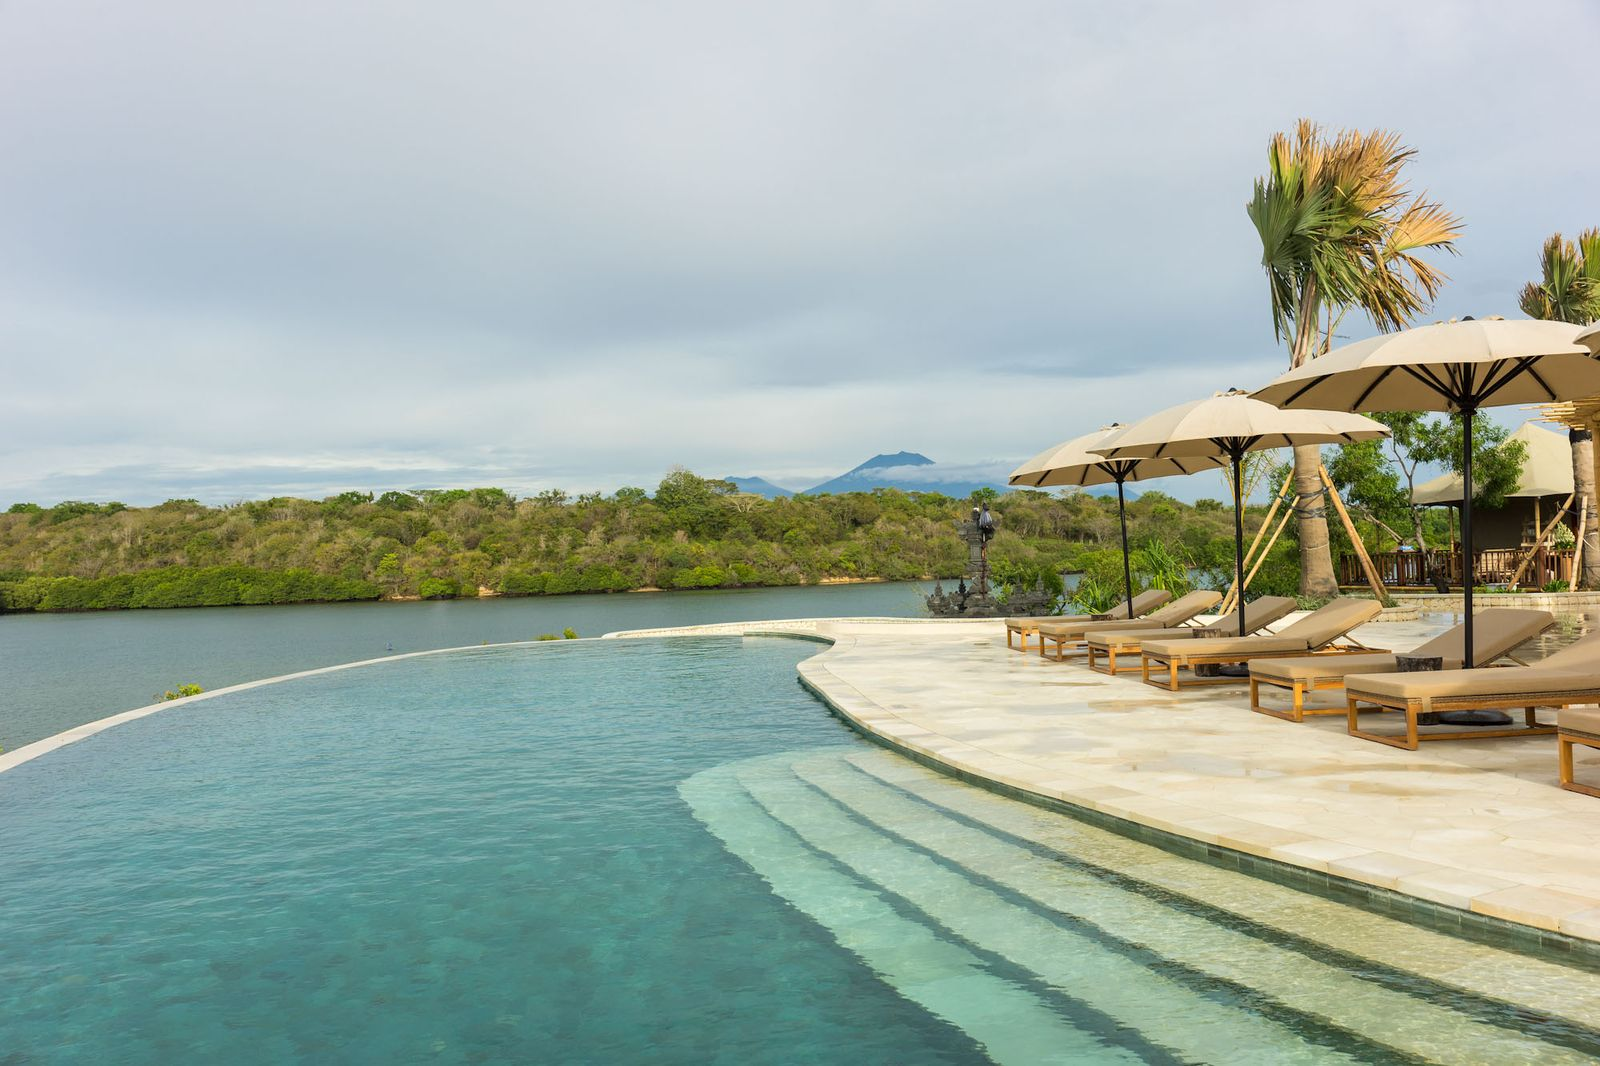 Bali Villa Dive Resort Preise